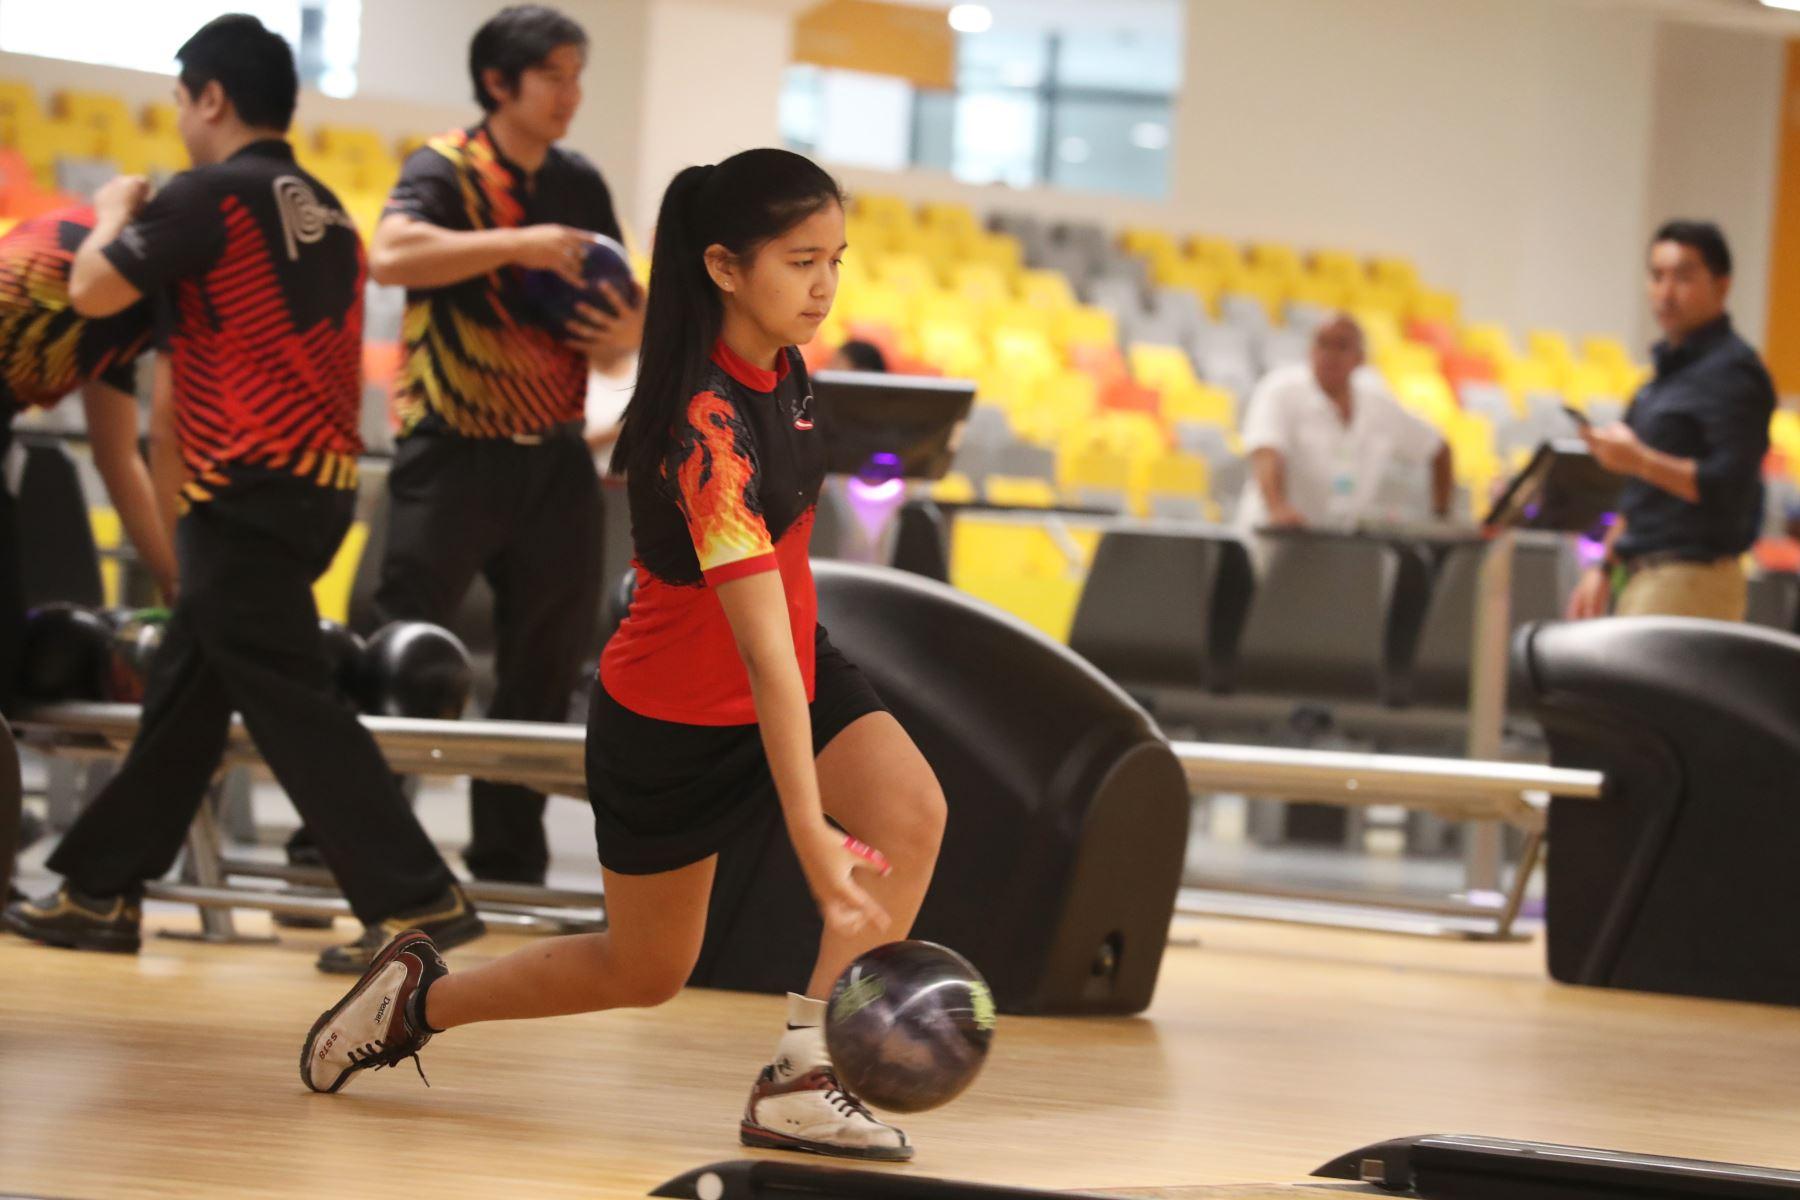 16 paises pertenecientes a Panam Sports participarán, teniendo así a 64 de los mejores jugadores de Bowling de América. Foto: ANDINA/Melina Mejía